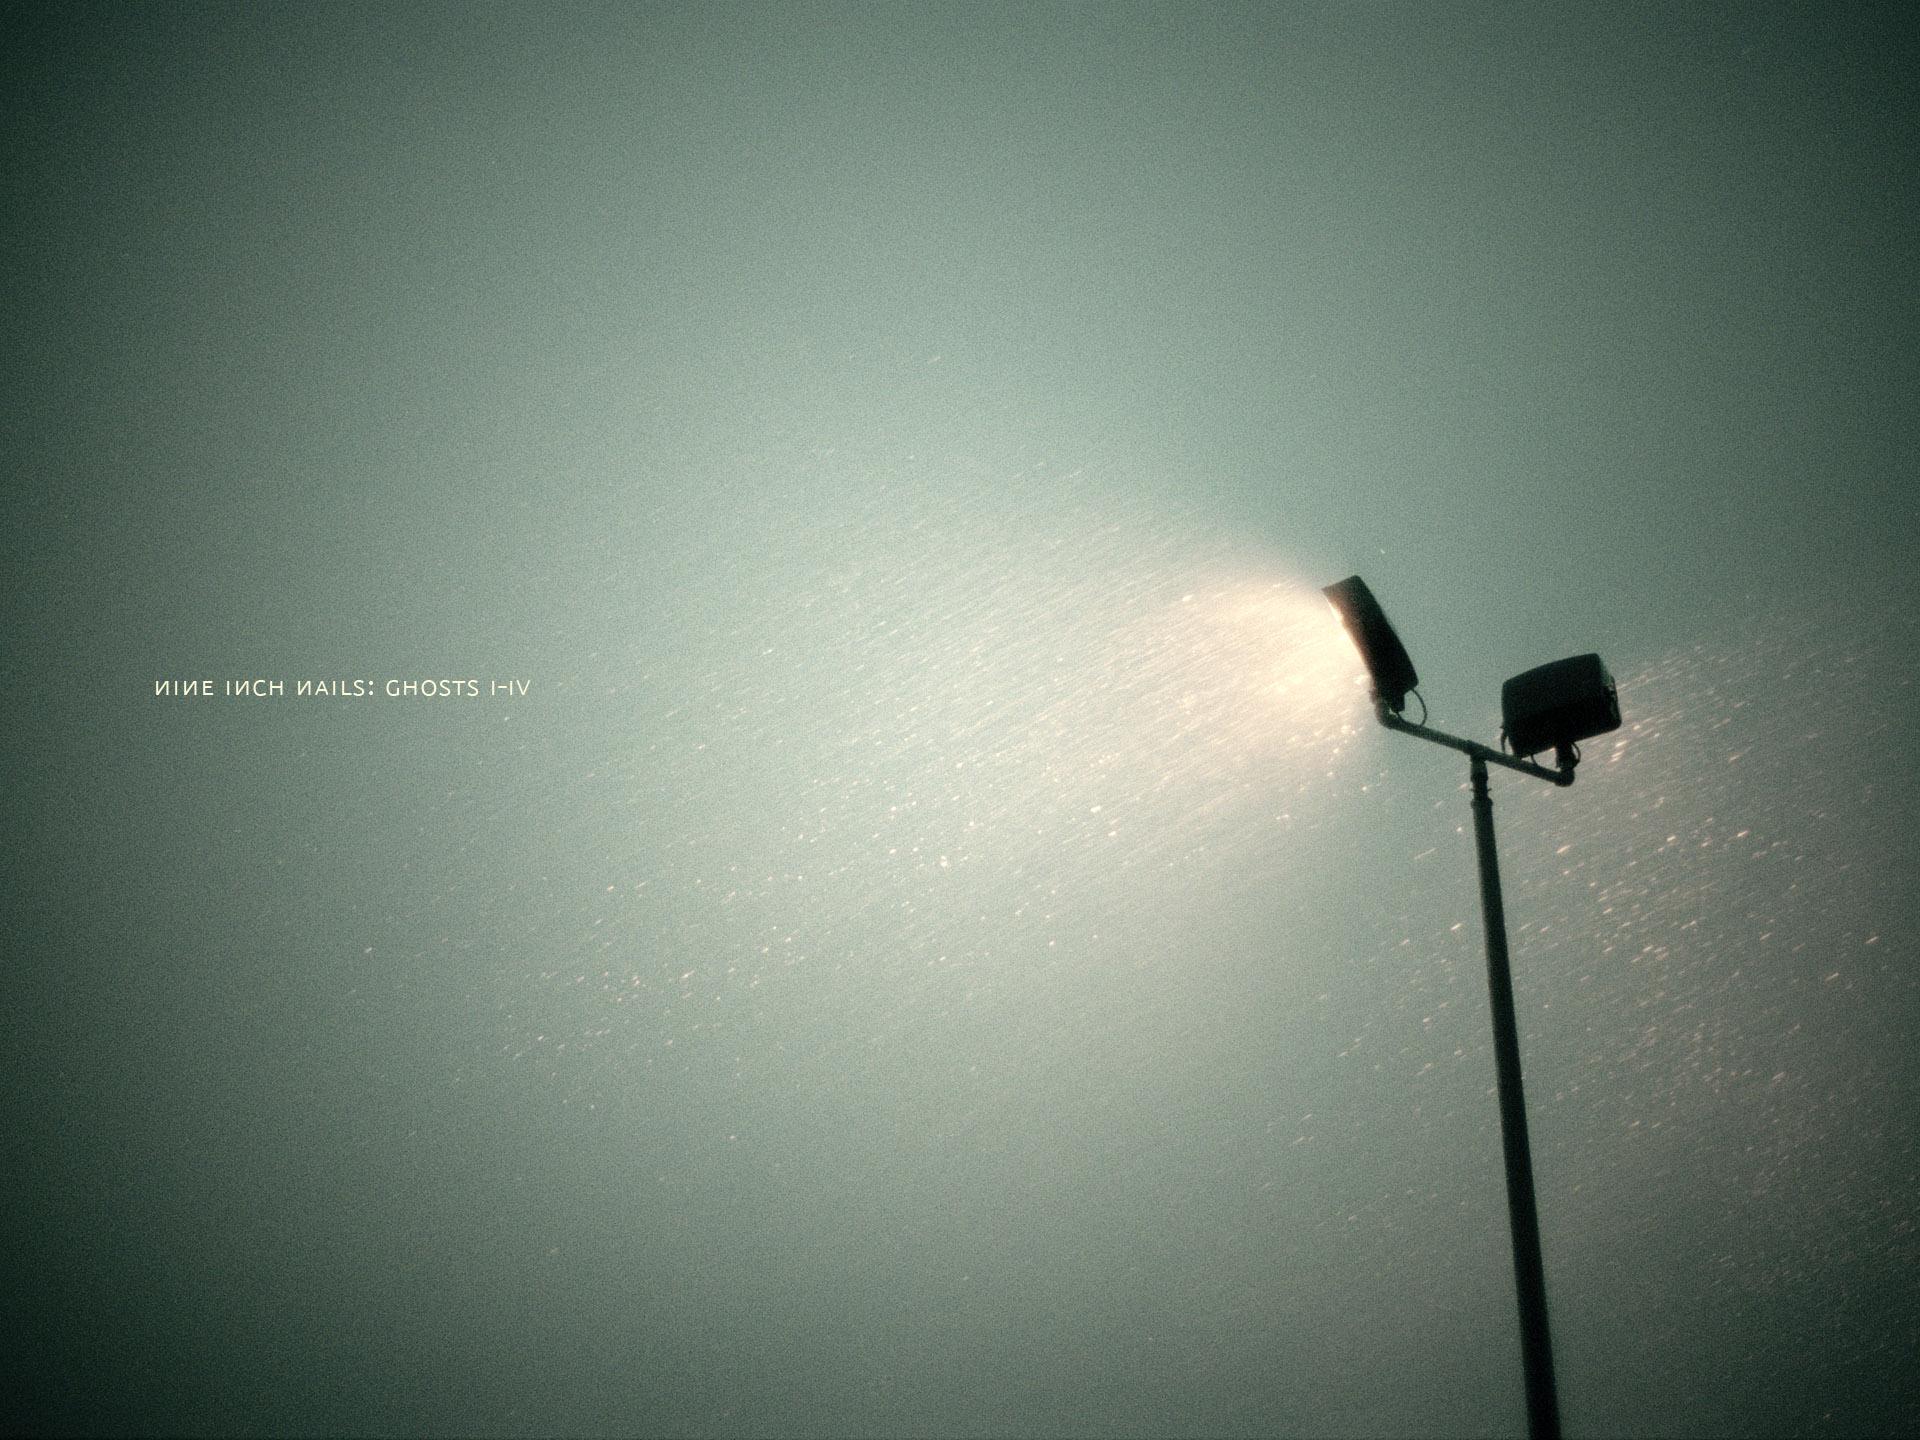 Nin Wallpapers 74 Images: Nine Inch Nails Fondos De Pantalla, Fondos De Escritorio